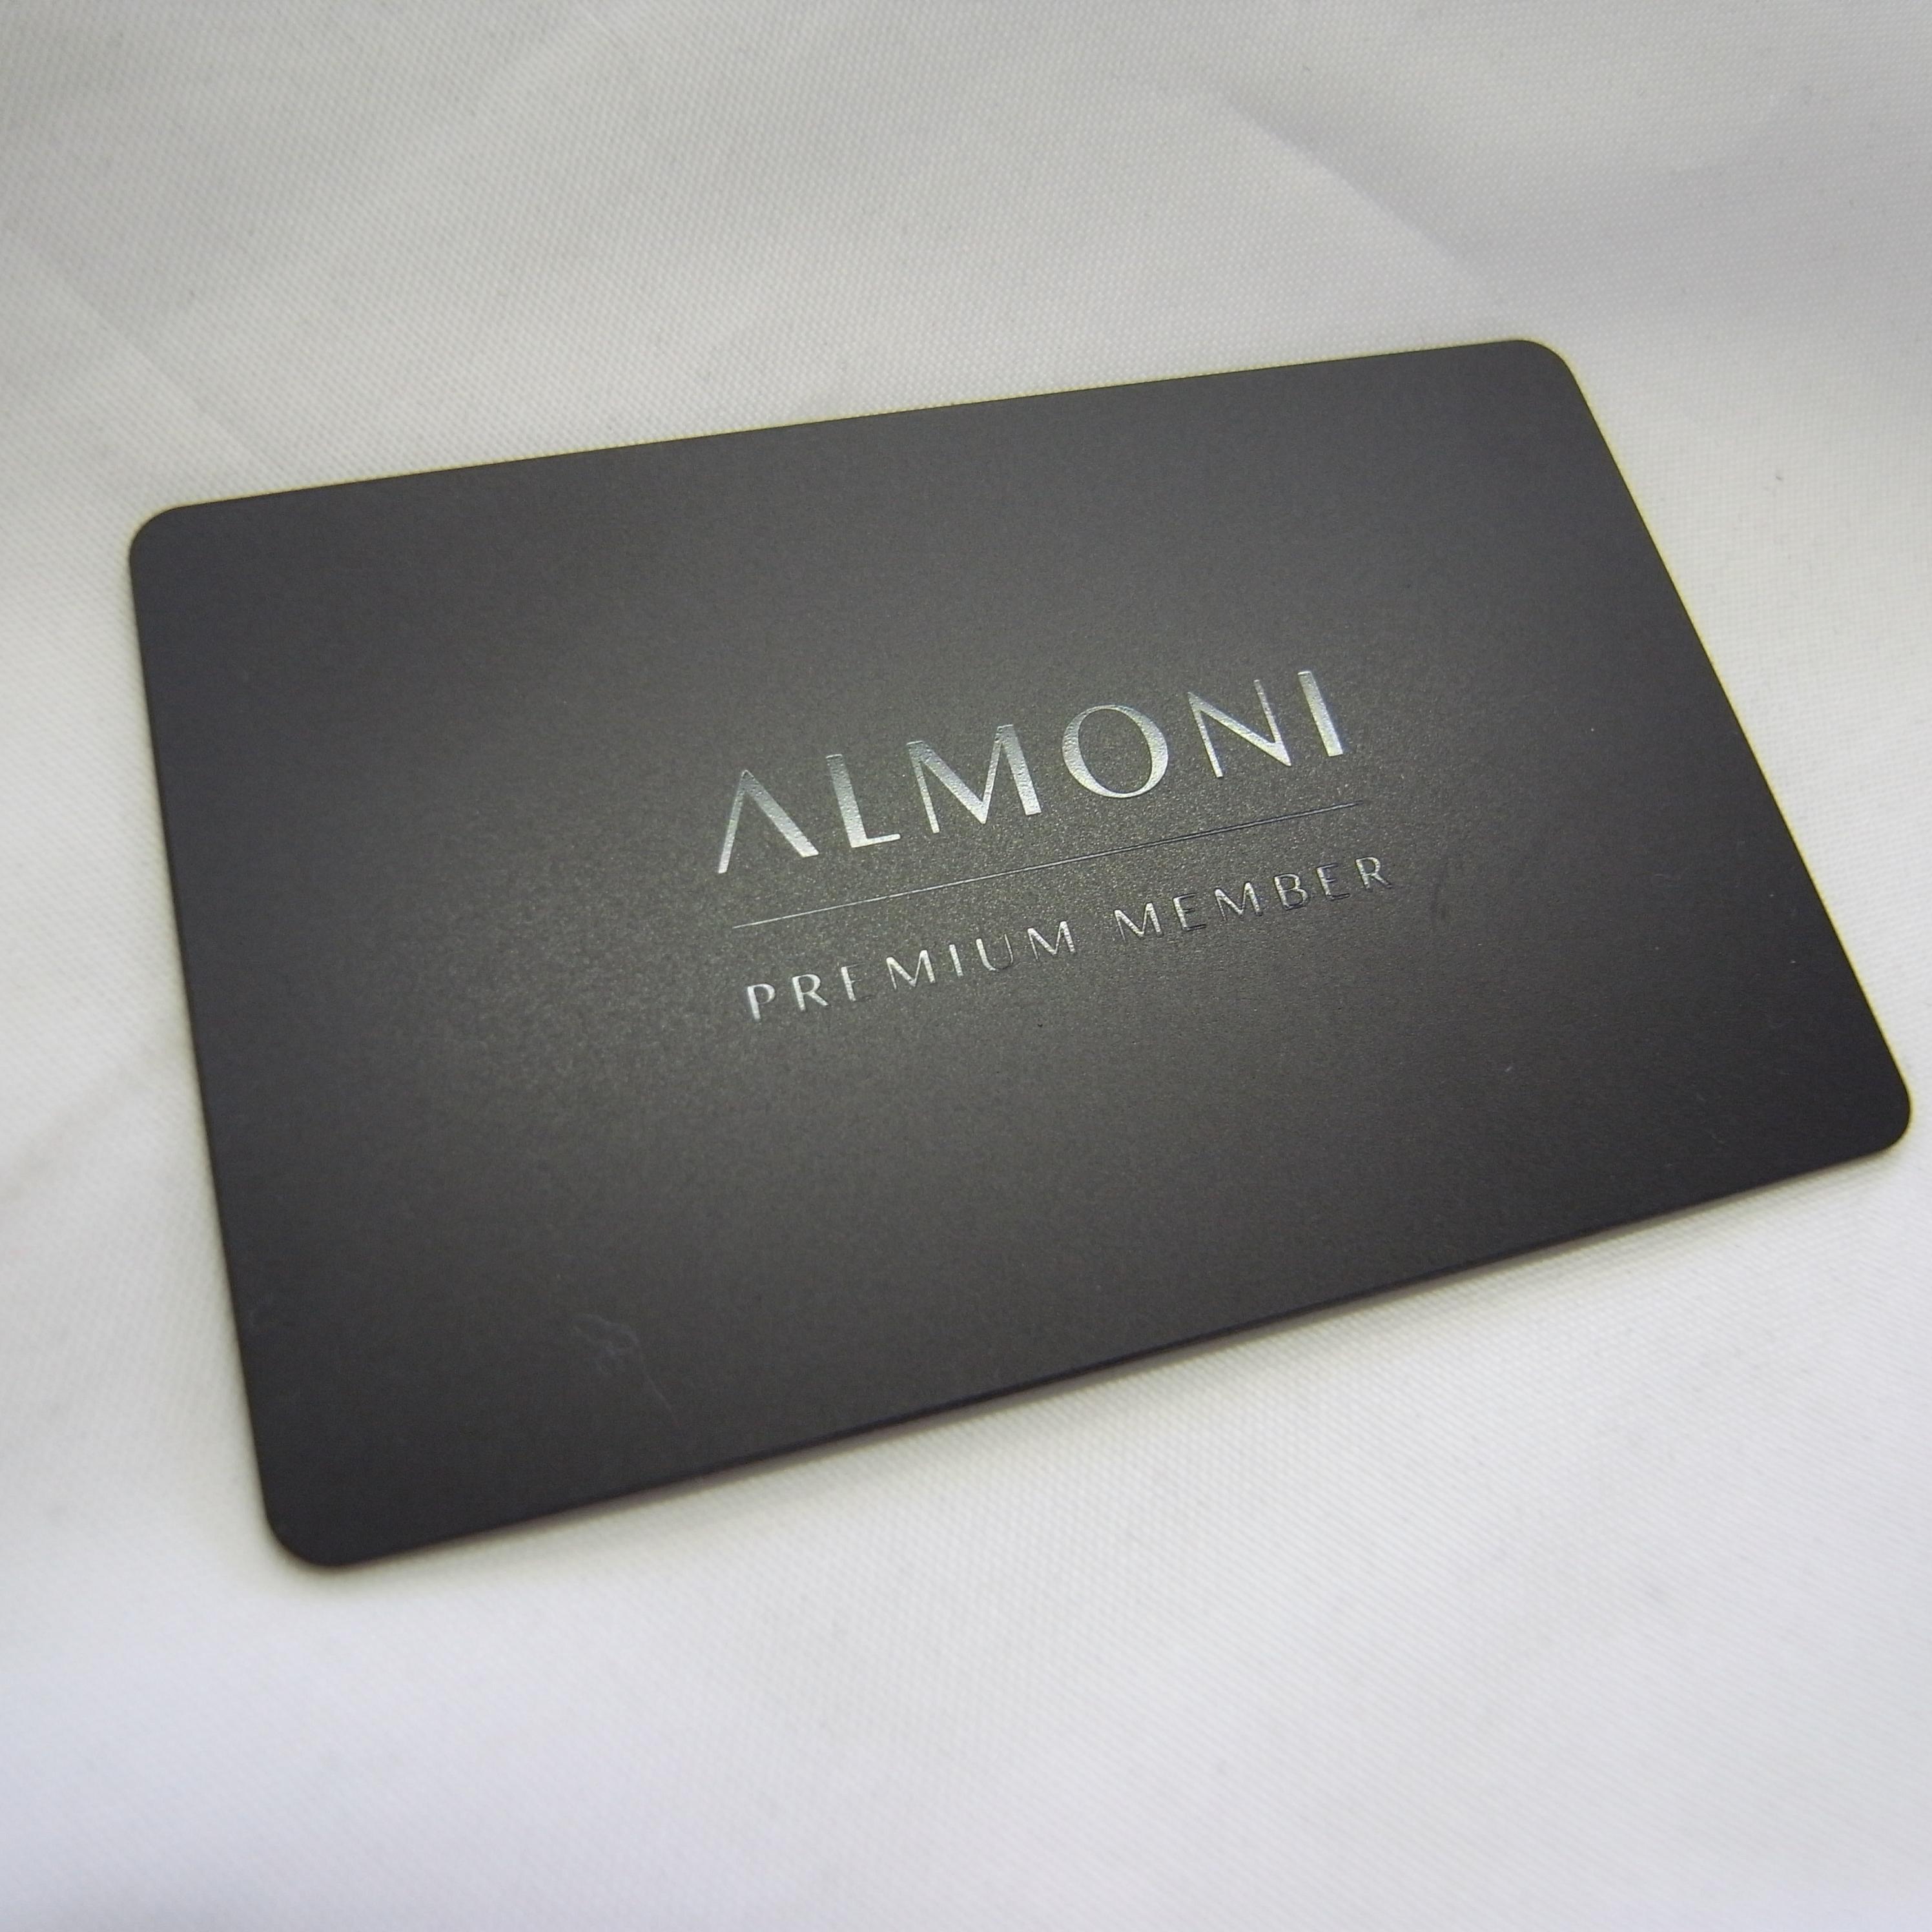 ALMONI メンバーズカード